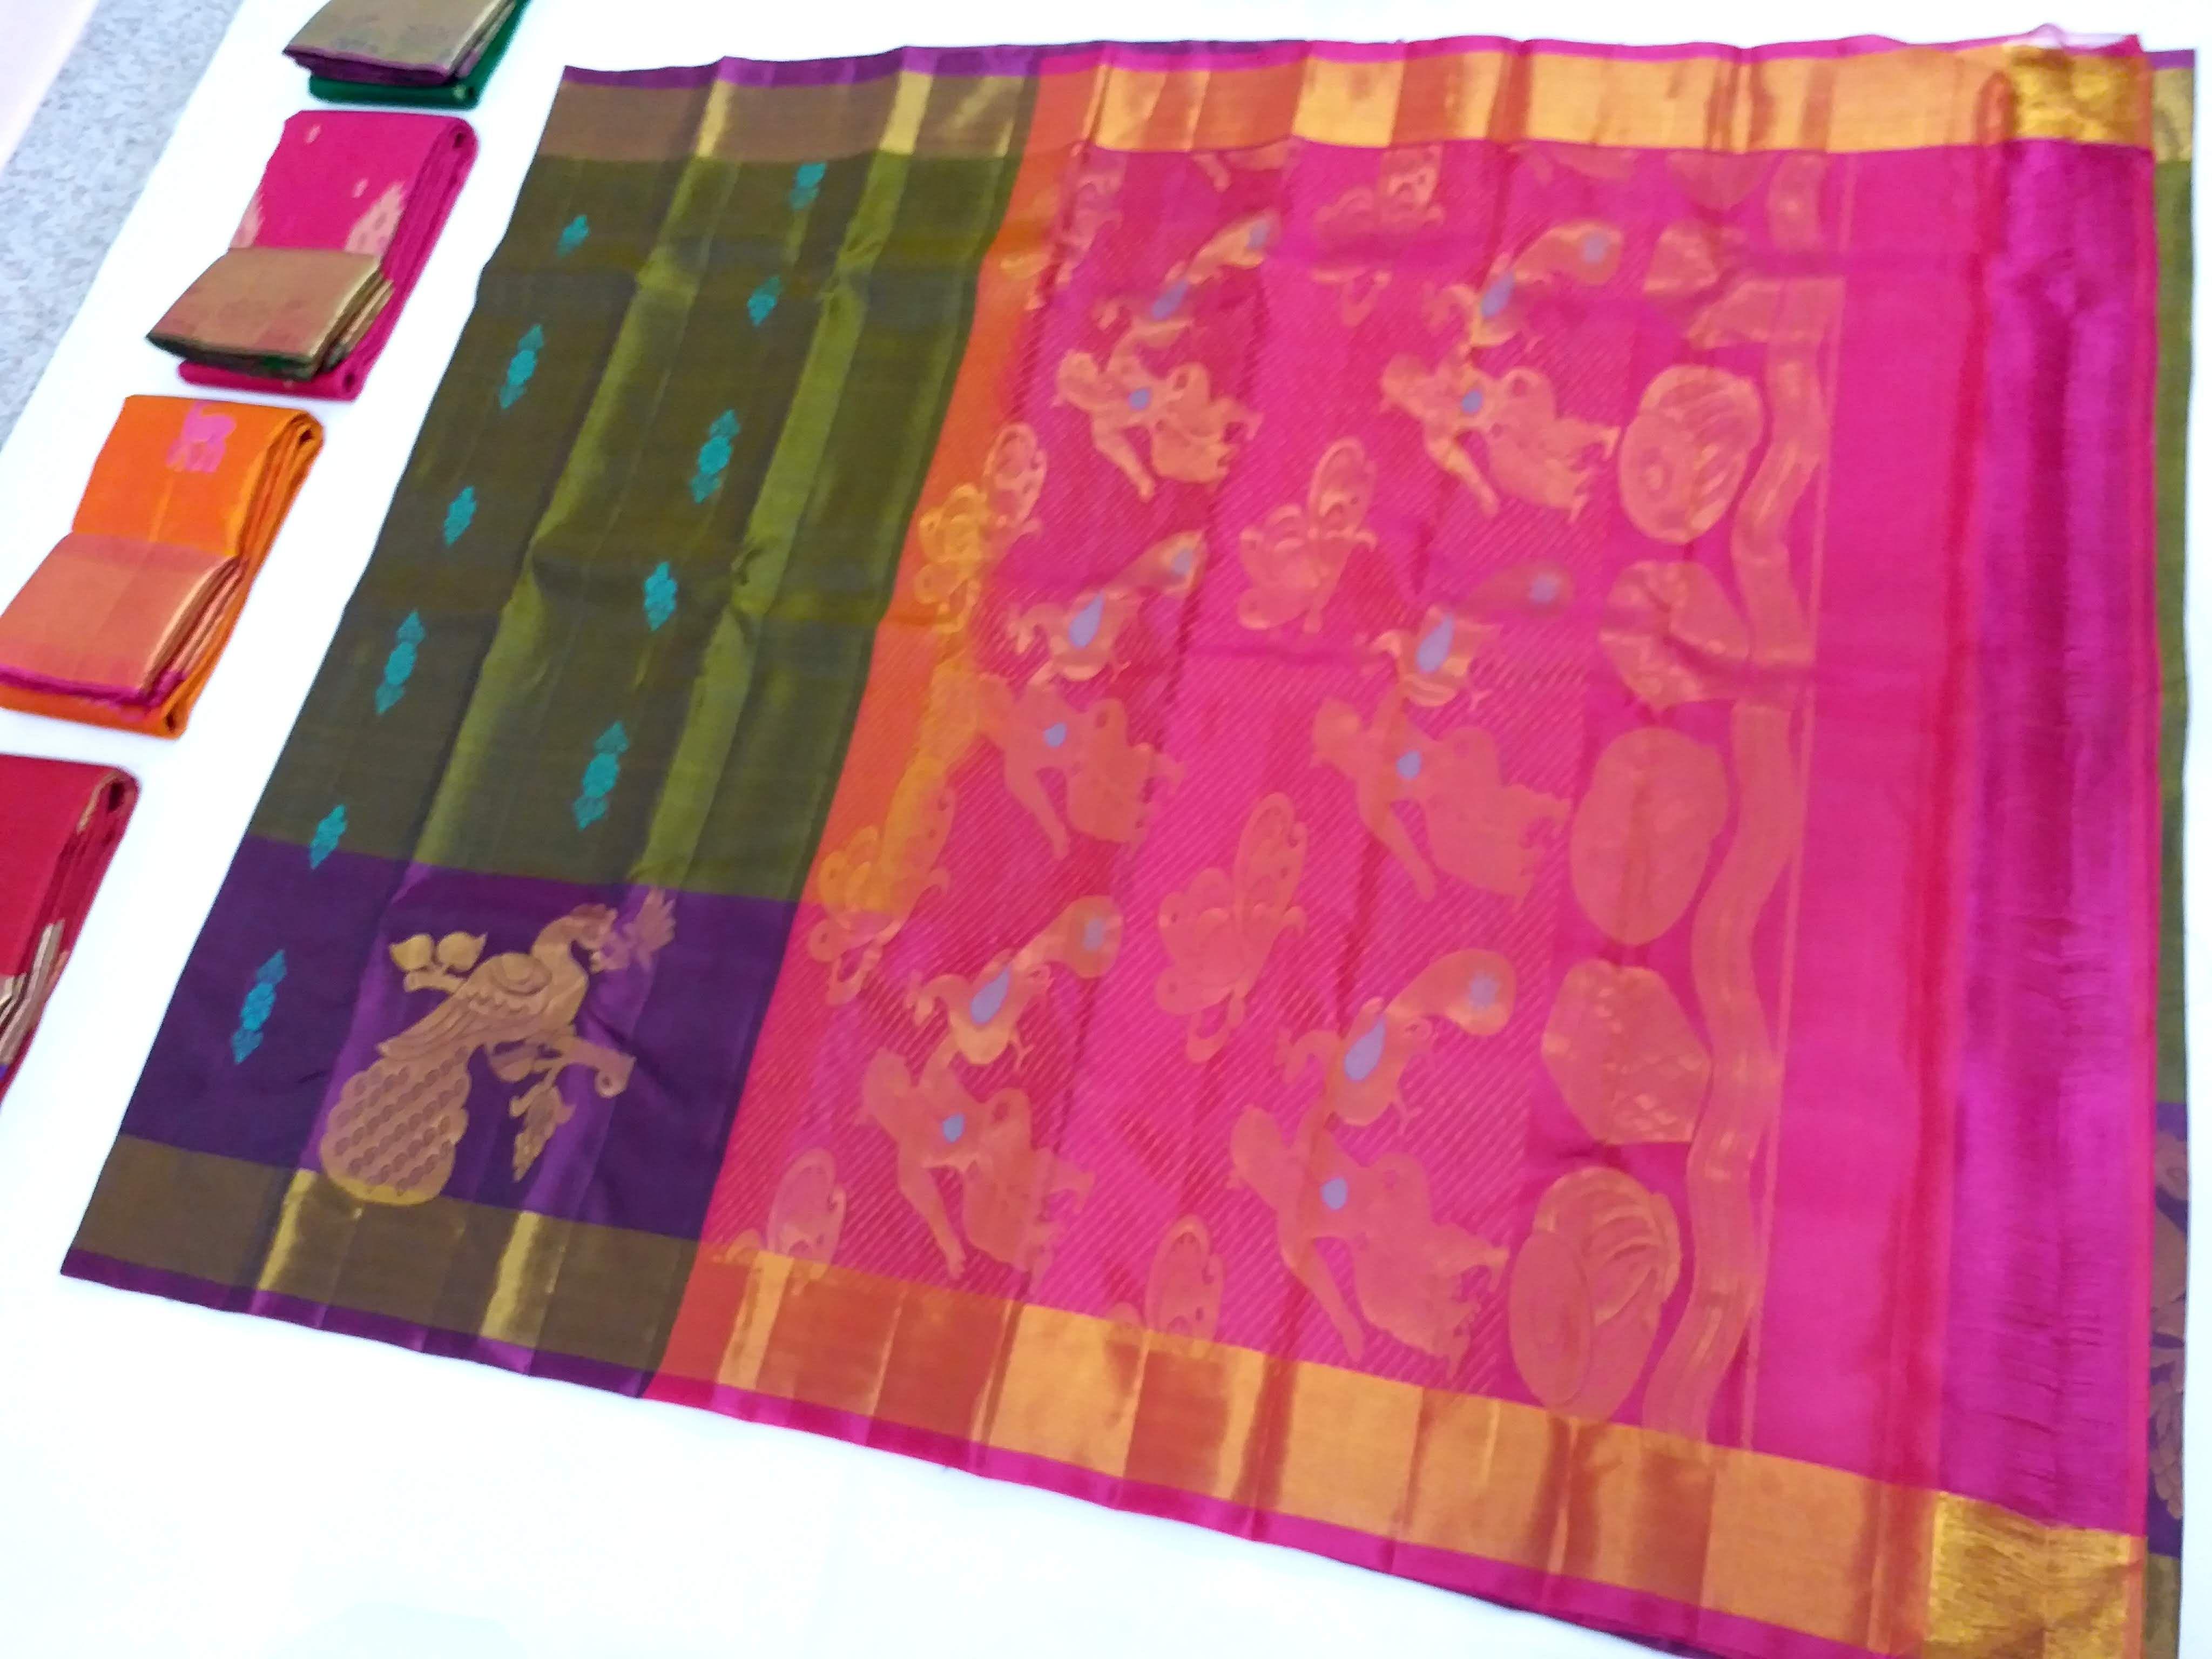 Sri Sarvalakshmi Silks Saree Manufacture & Wholesale Supplier Famous